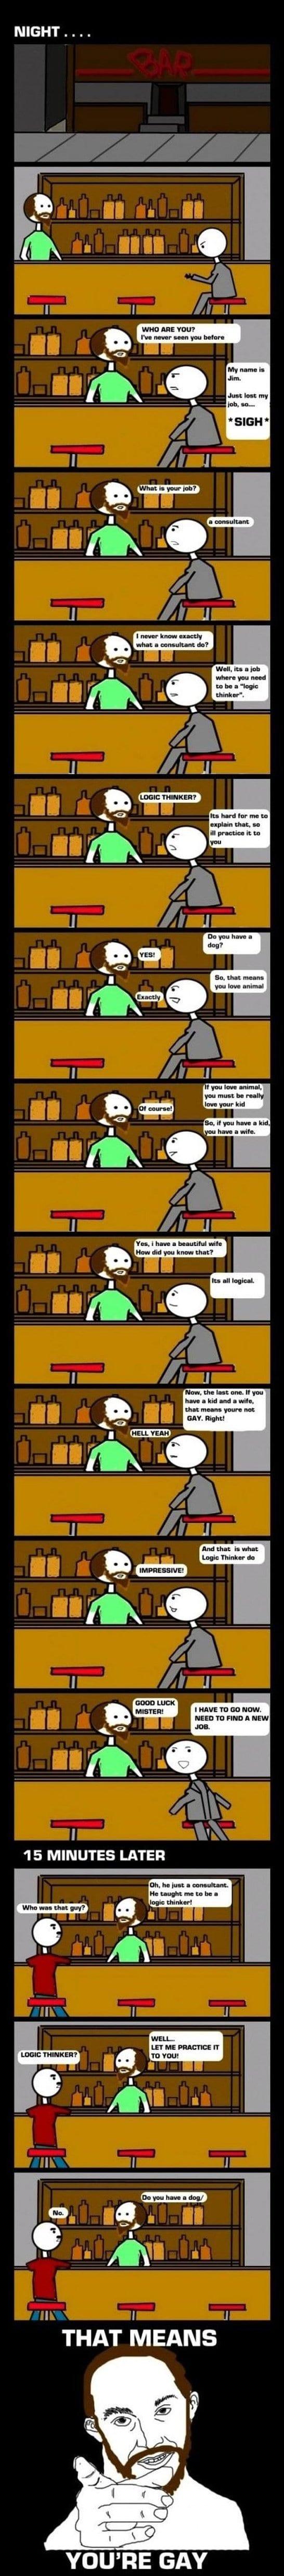 funny-logic-thinker-funny-pictures-meme-jokes